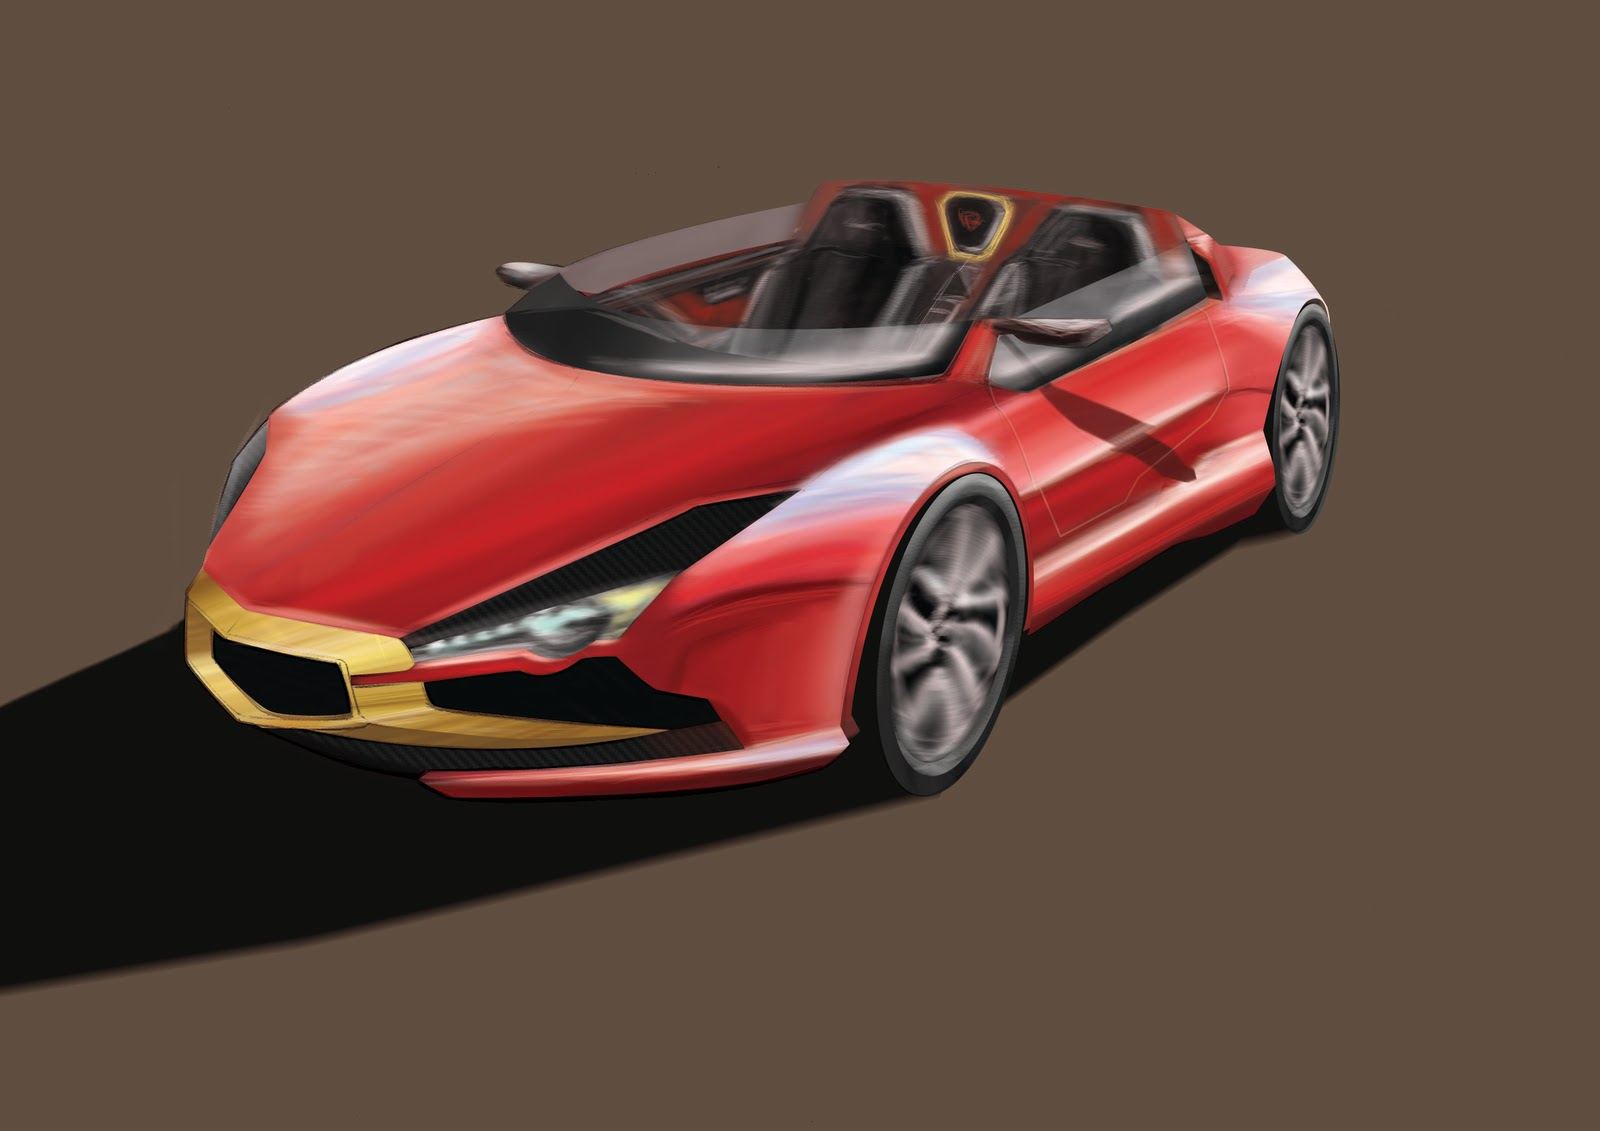 Simon Drew Automotive Designer Ducati Sports Car Render